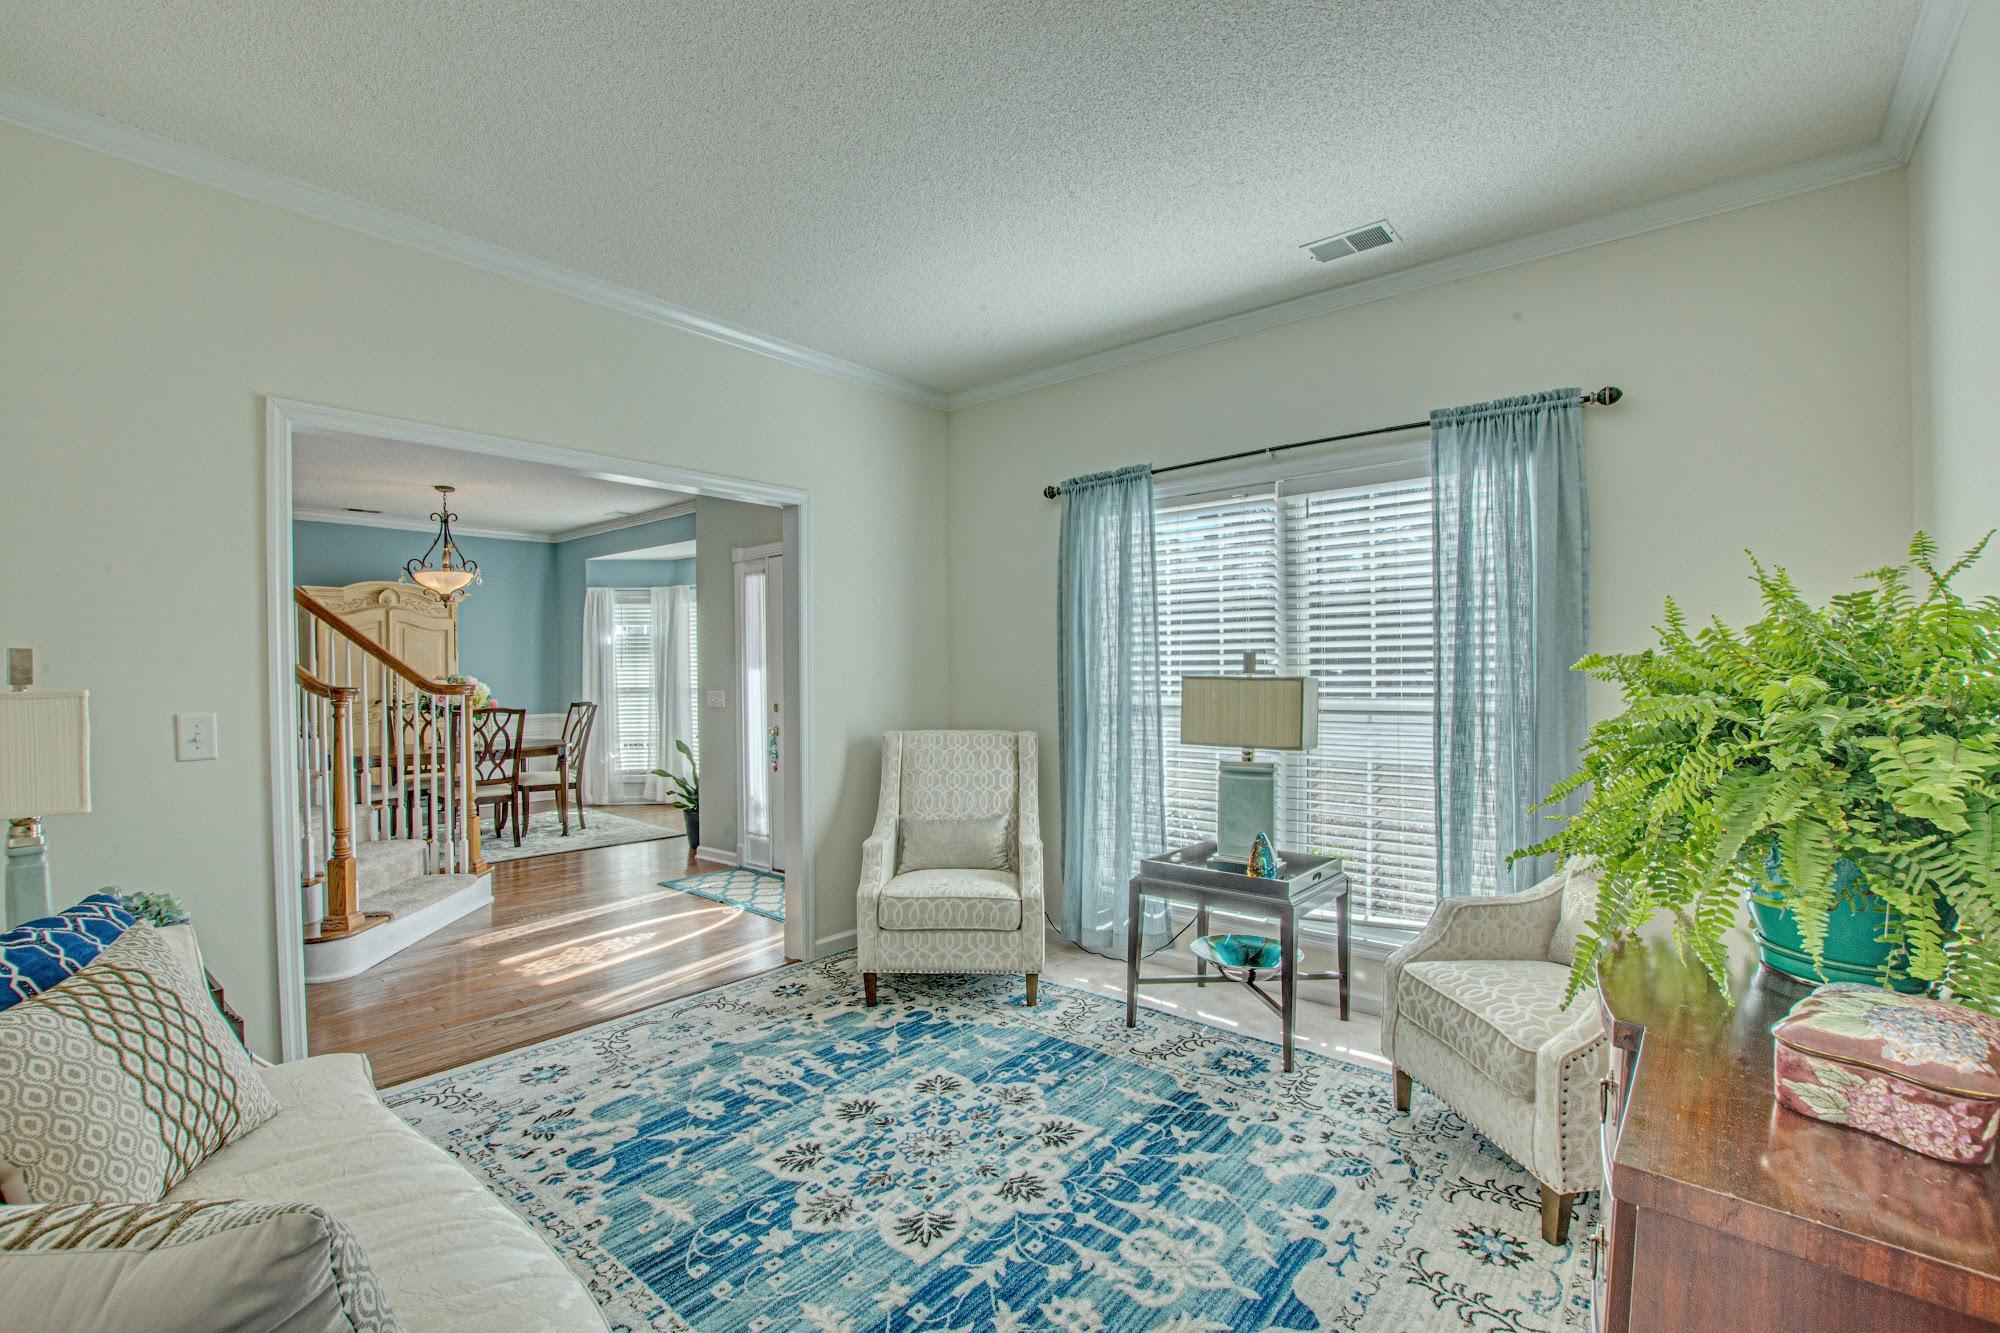 Indigo Fields Homes For Sale - 5512 Rowsham, North Charleston, SC - 50